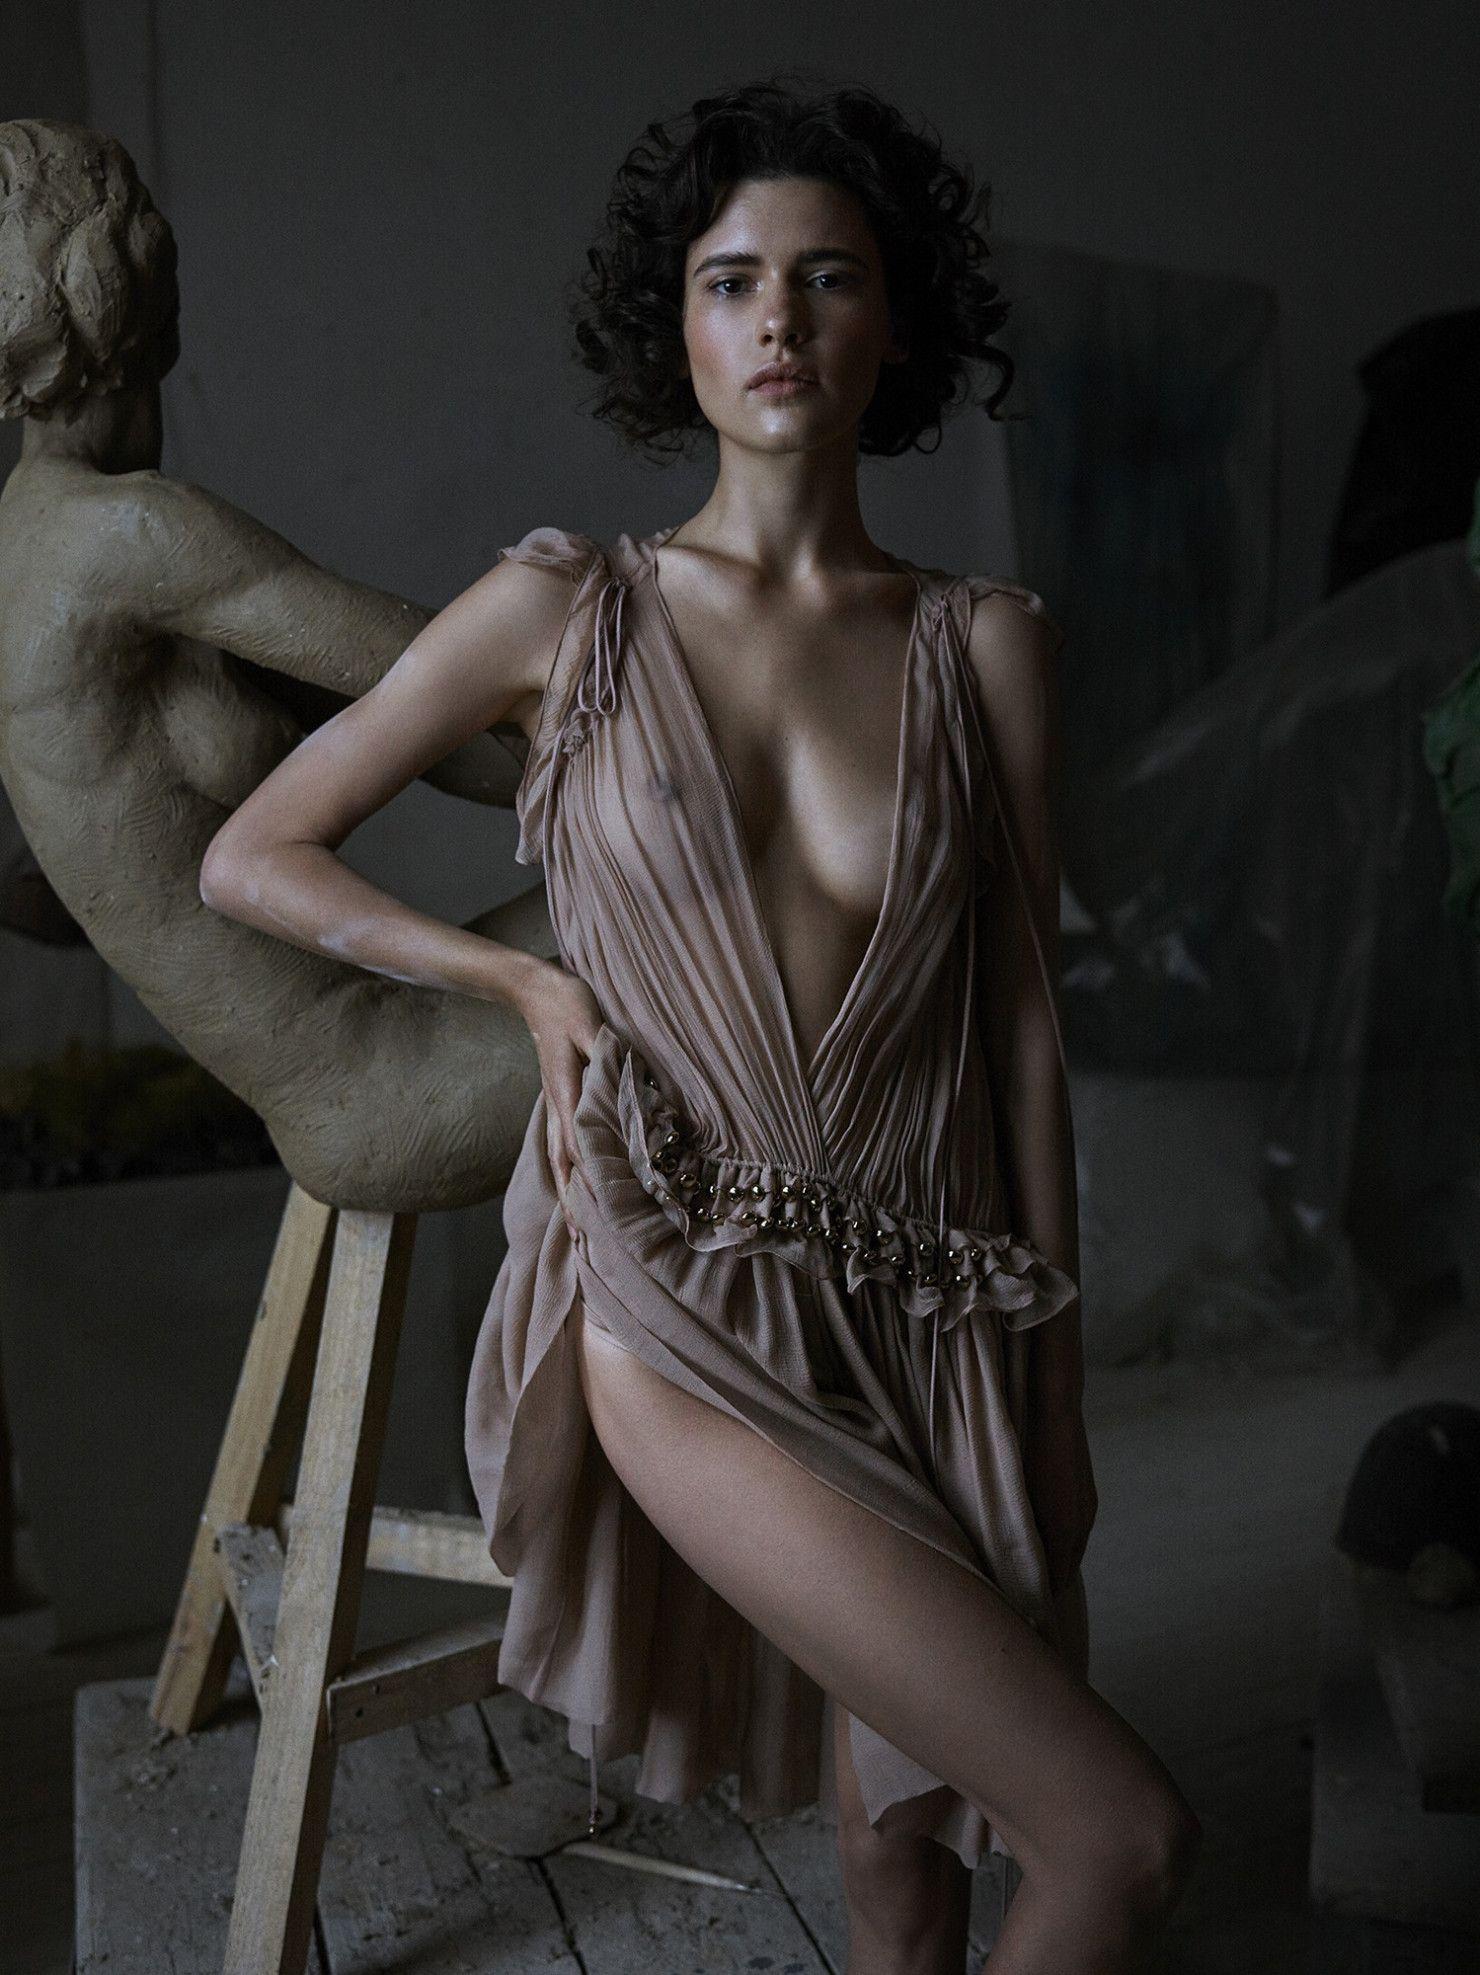 Bella ortiz naked think, that